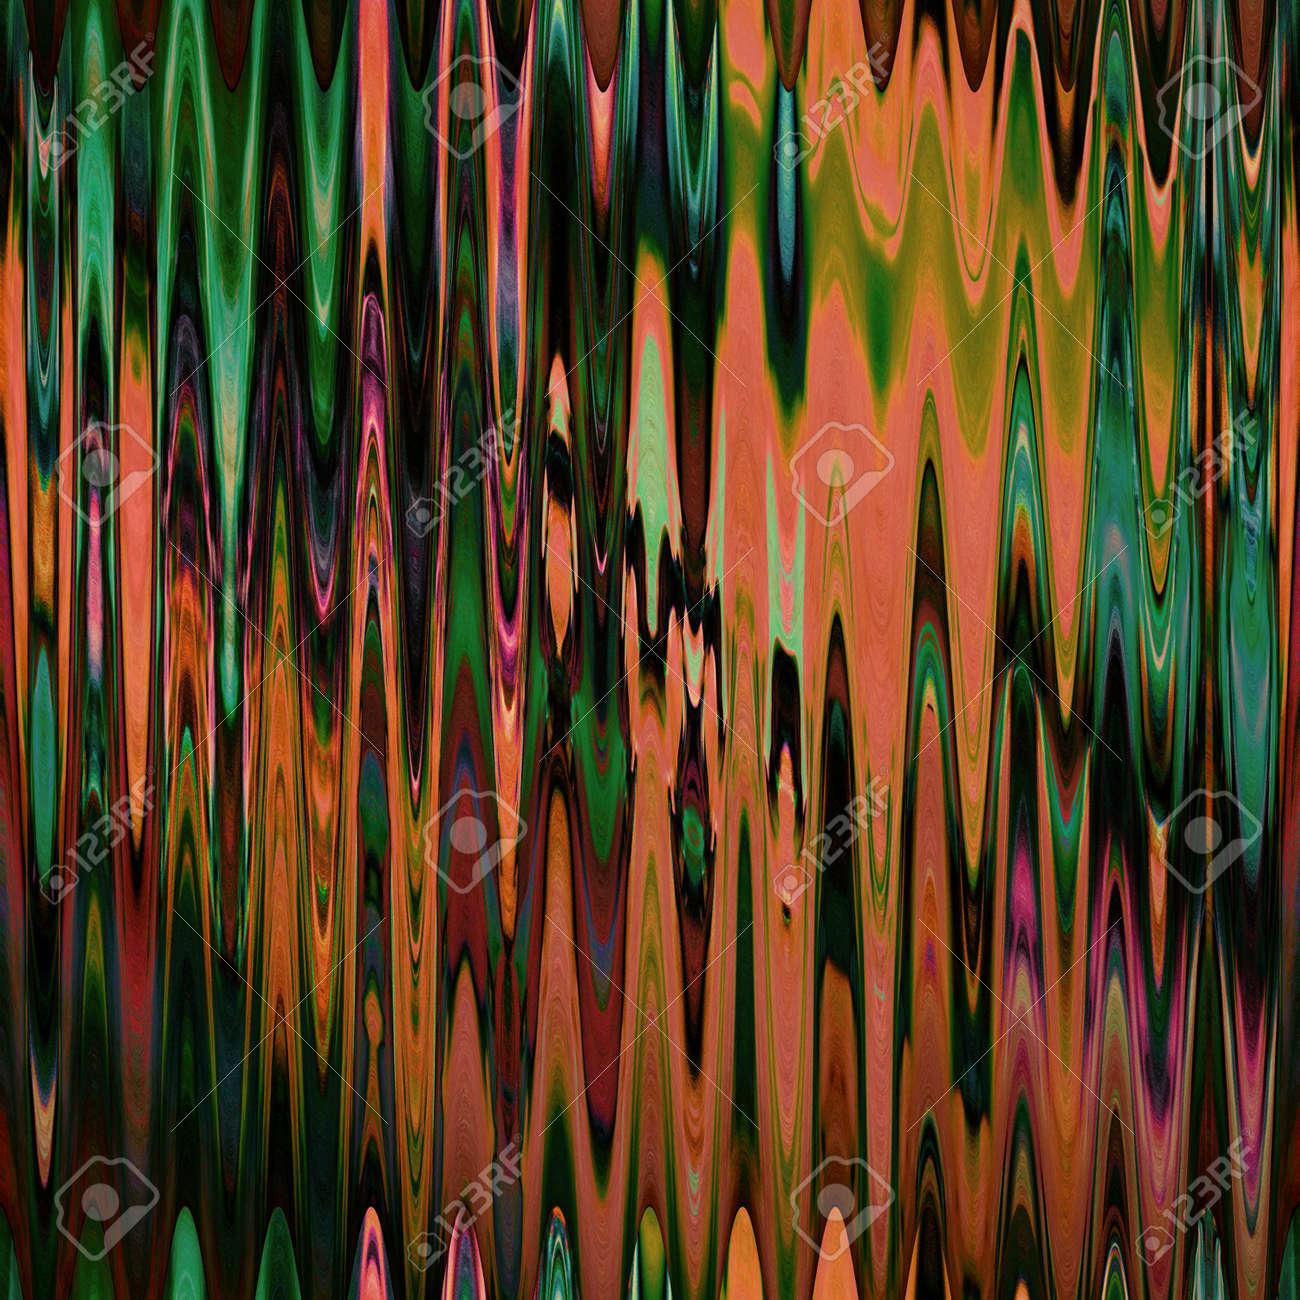 art abstract grunge  texture geometric background Stock Photo - 17387678